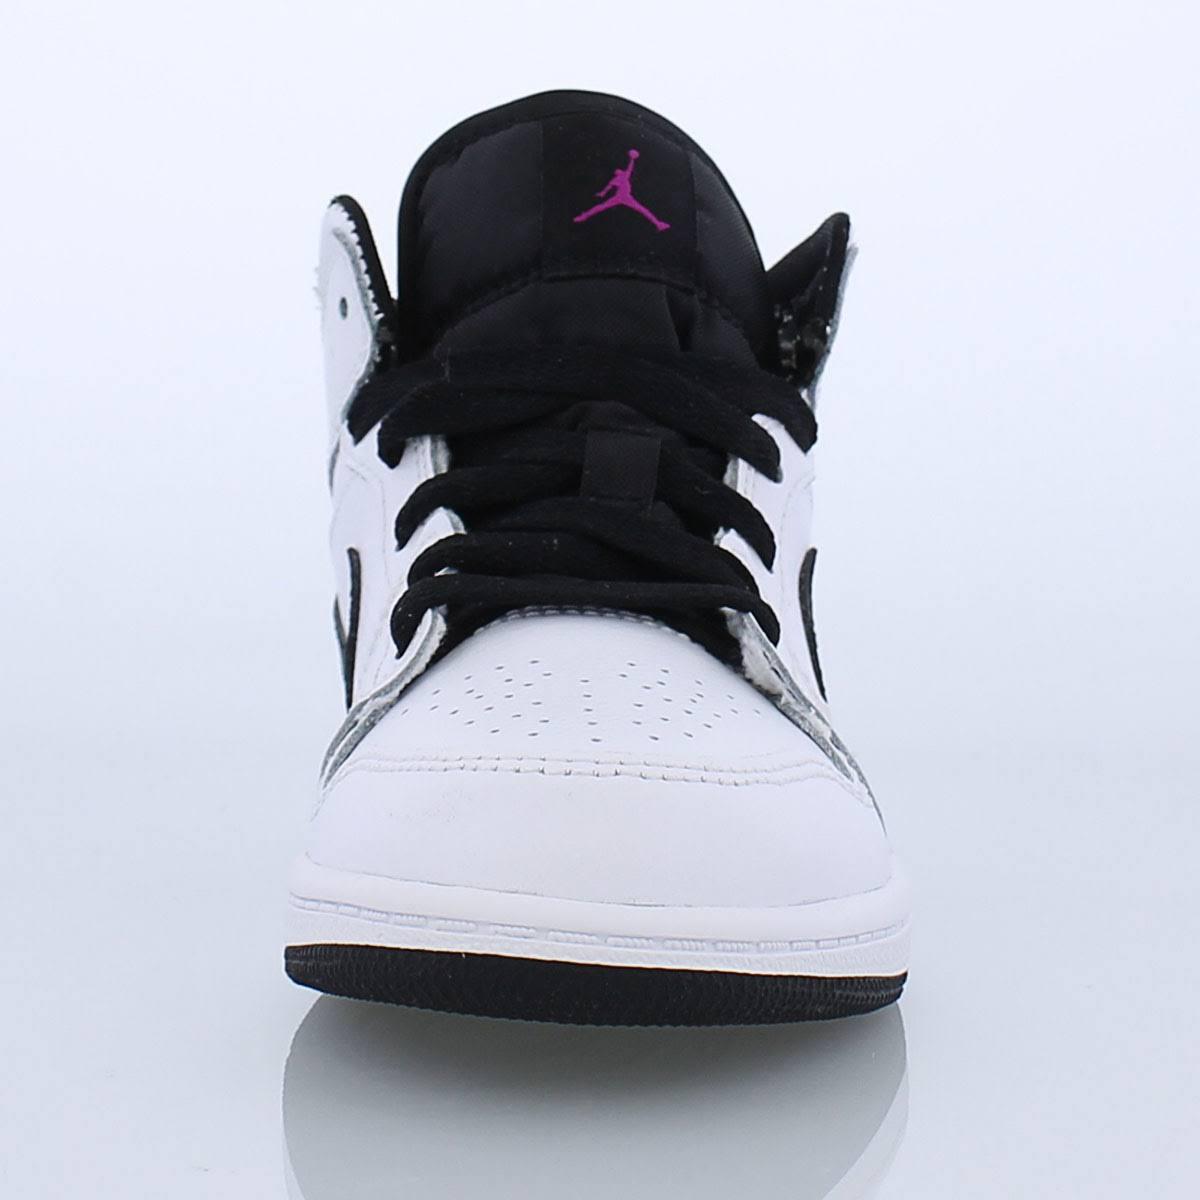 Vorschule Aj Größe Basketballschuhe Jordan 640737138 1 Mädchen Mid wa6qCI